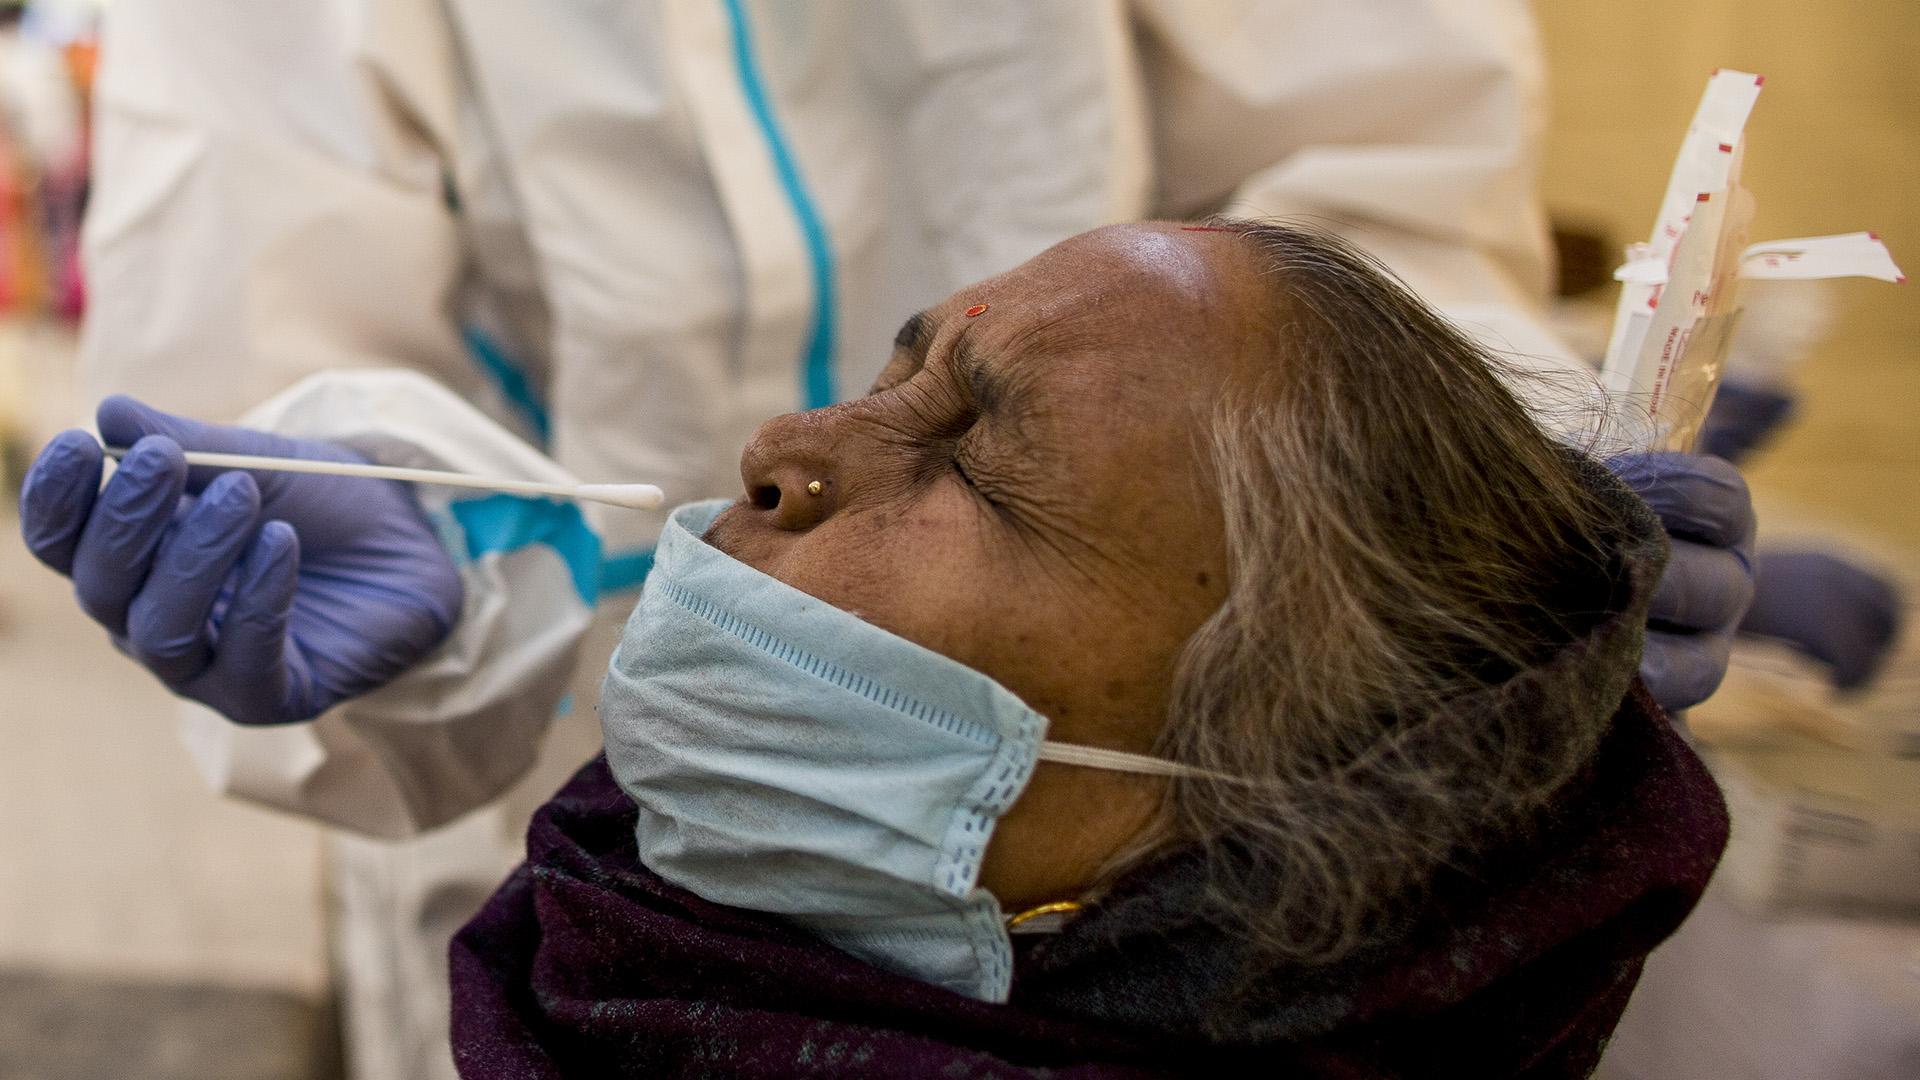 Nasal Spray For Covid-19 Treatment To Hit Asian Markets